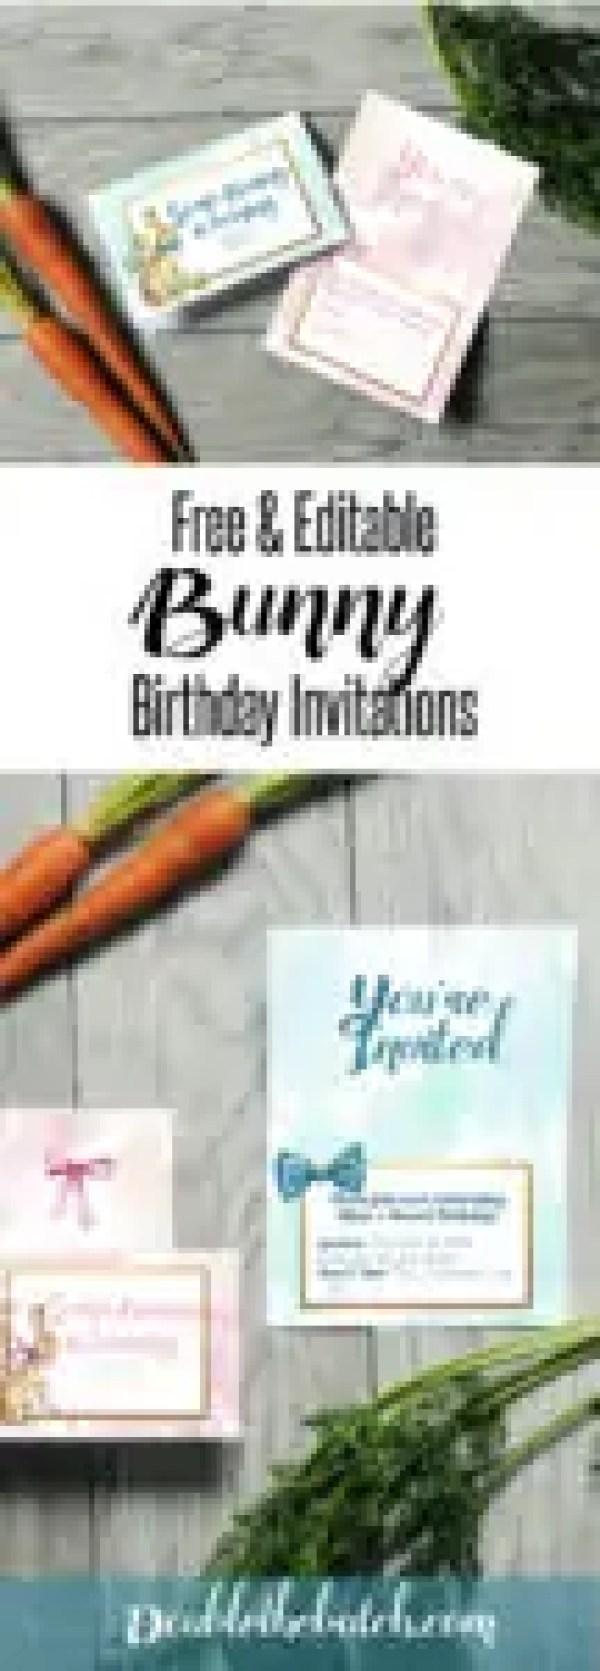 Free printable birthday invites uplifting mayhem free printable birthday invites filmwisefo